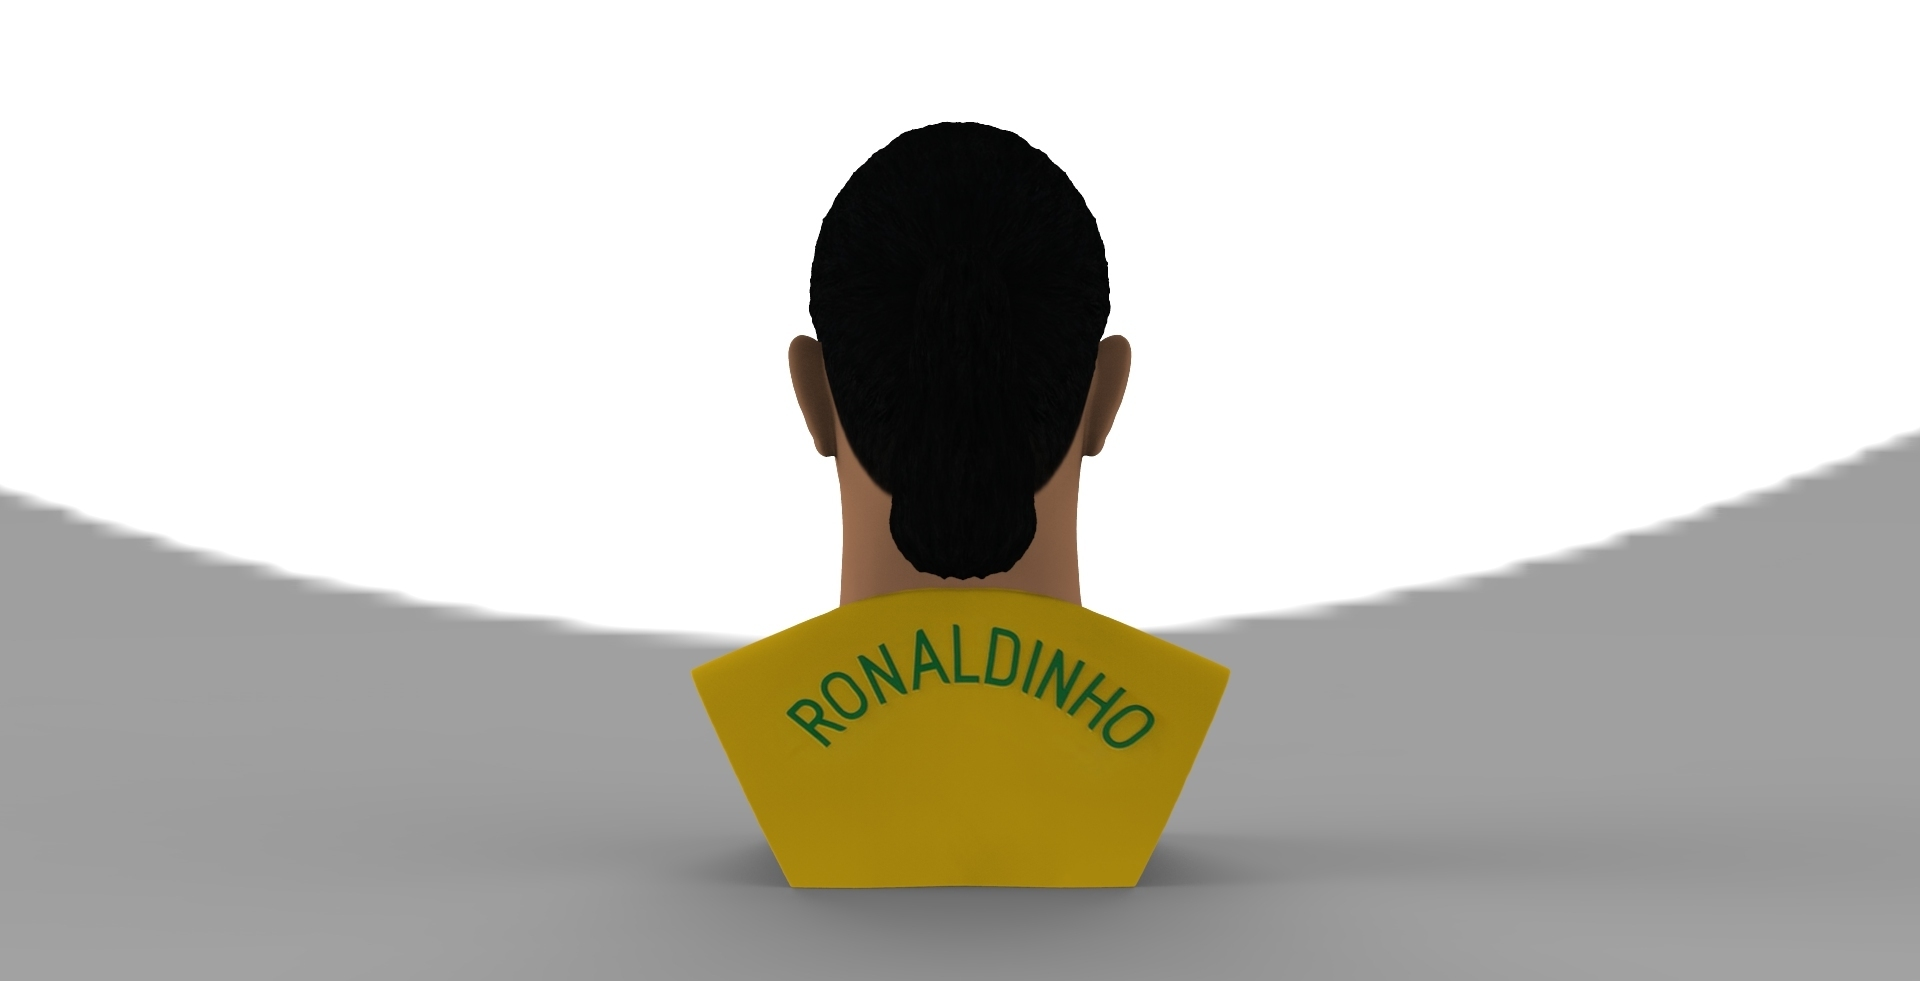 untitled.1683.jpg Download STL file Ronaldinho bust ready for full color 3D printing • 3D print model, PrintedReality